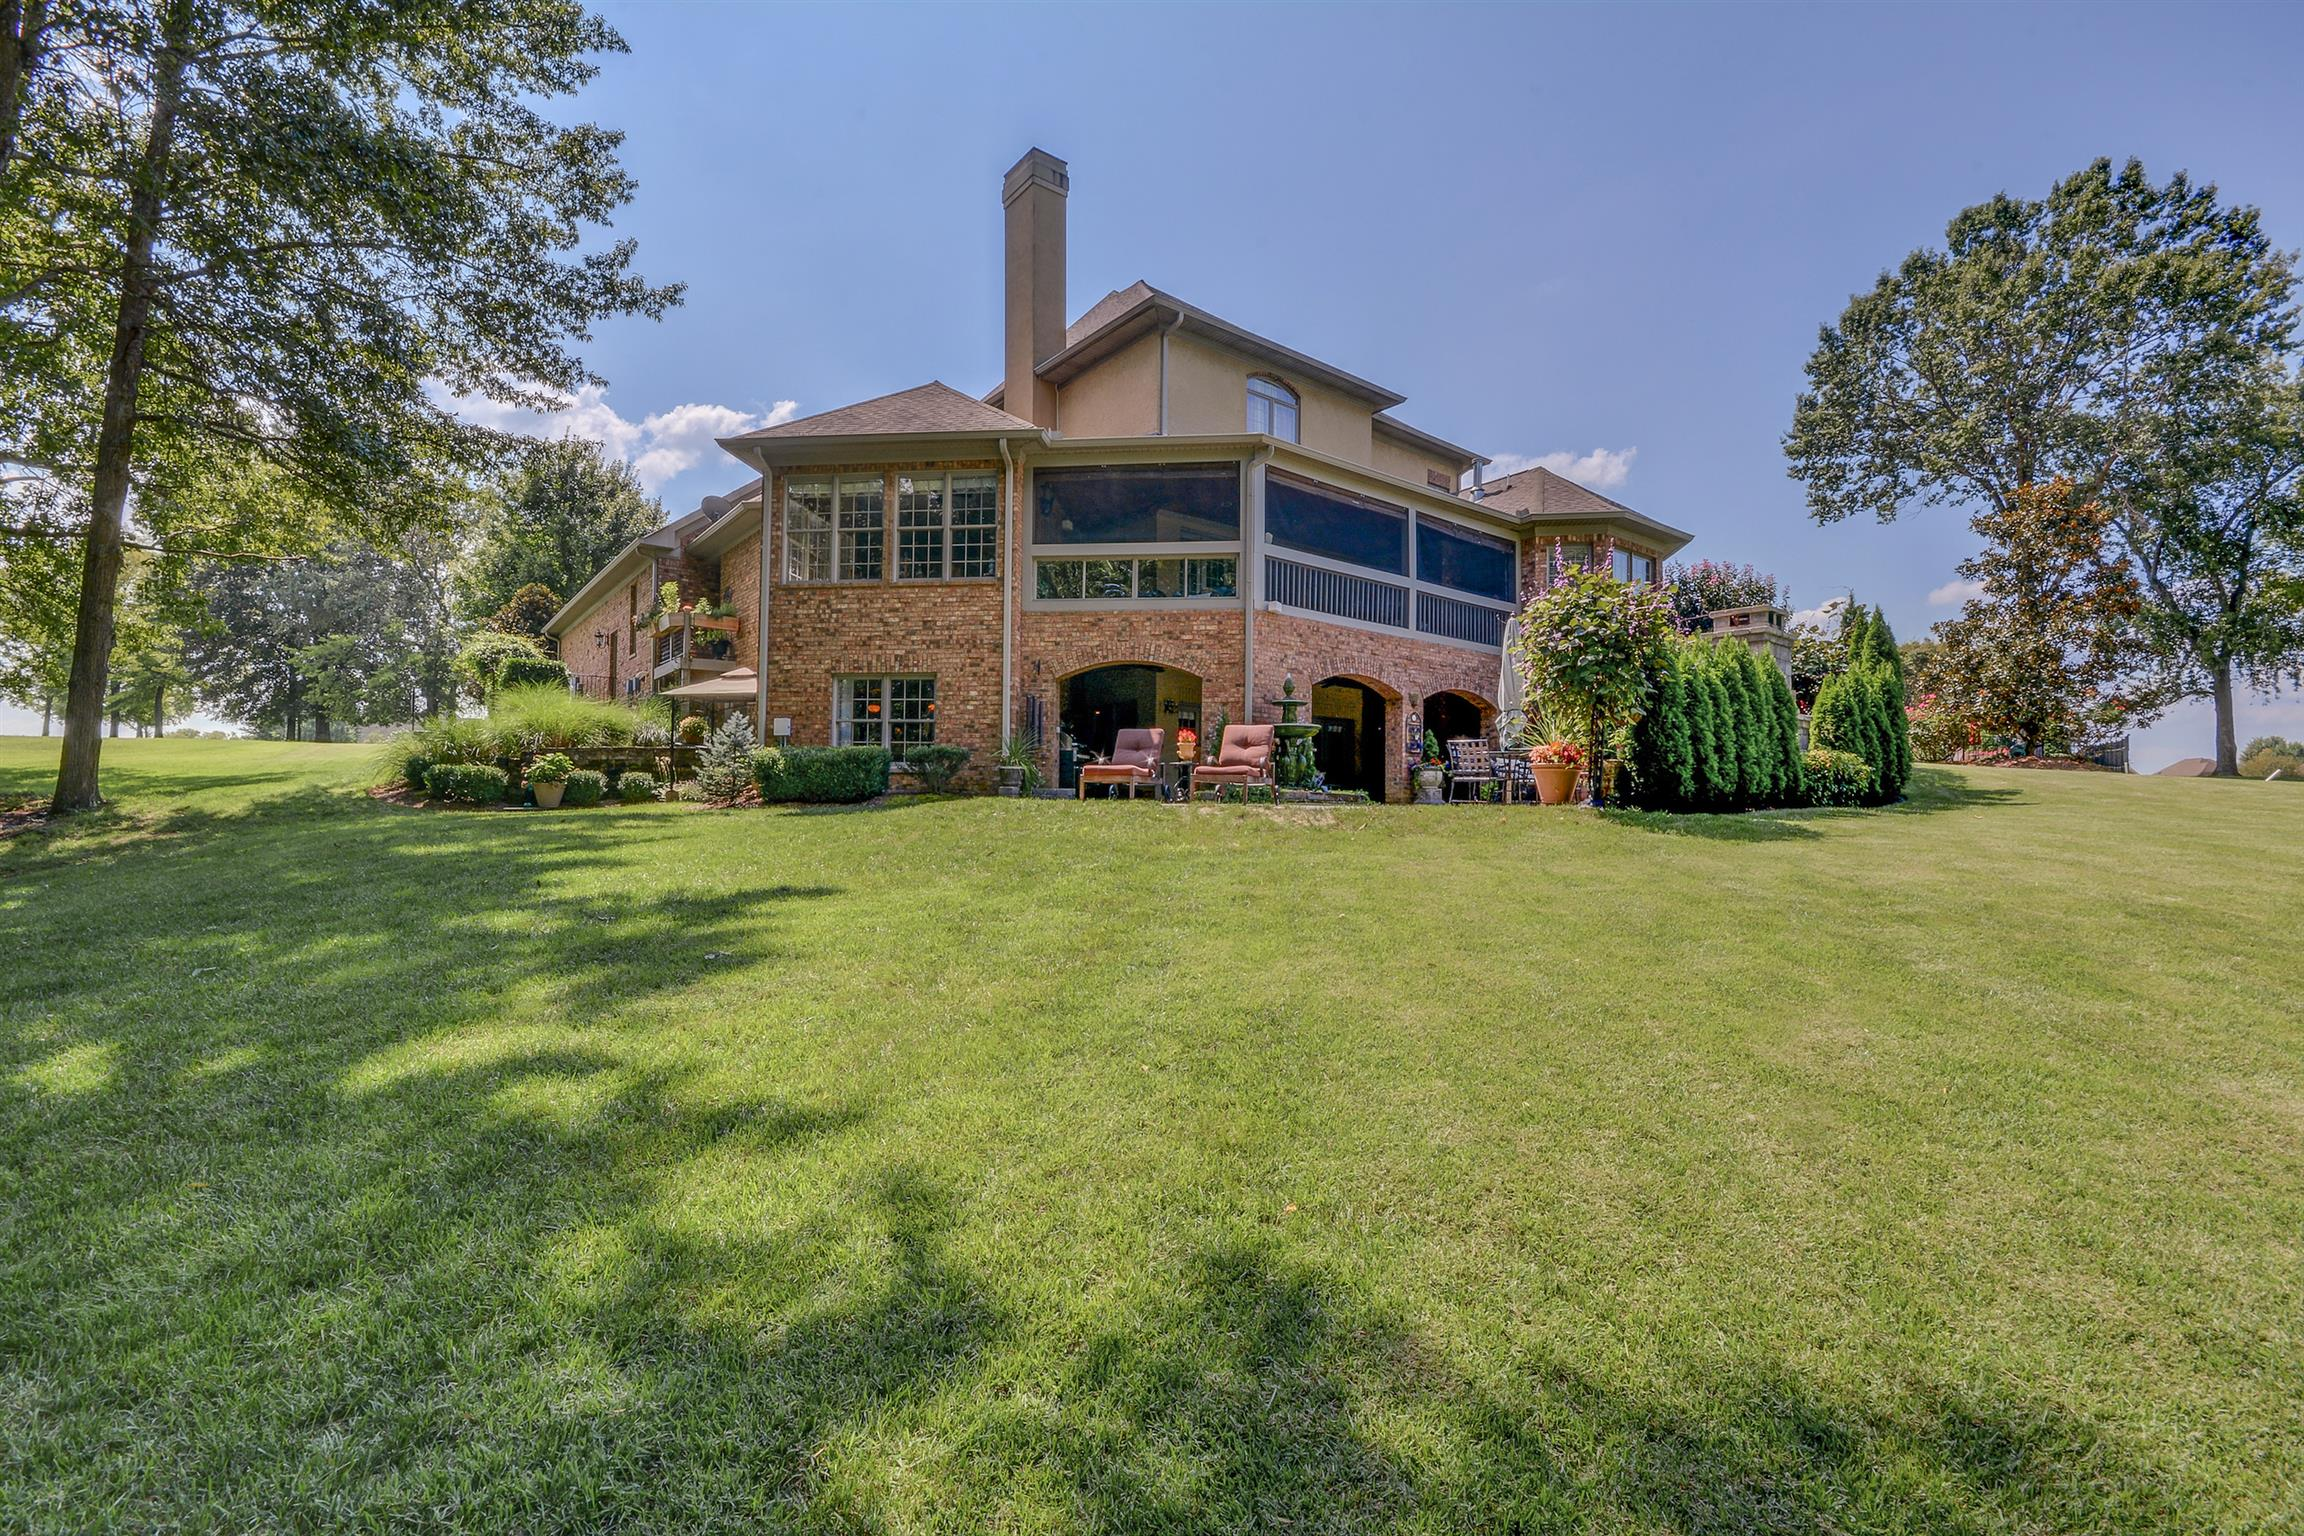 900 Plantation Way, Gallatin, TN 37066 - Gallatin, TN real estate listing